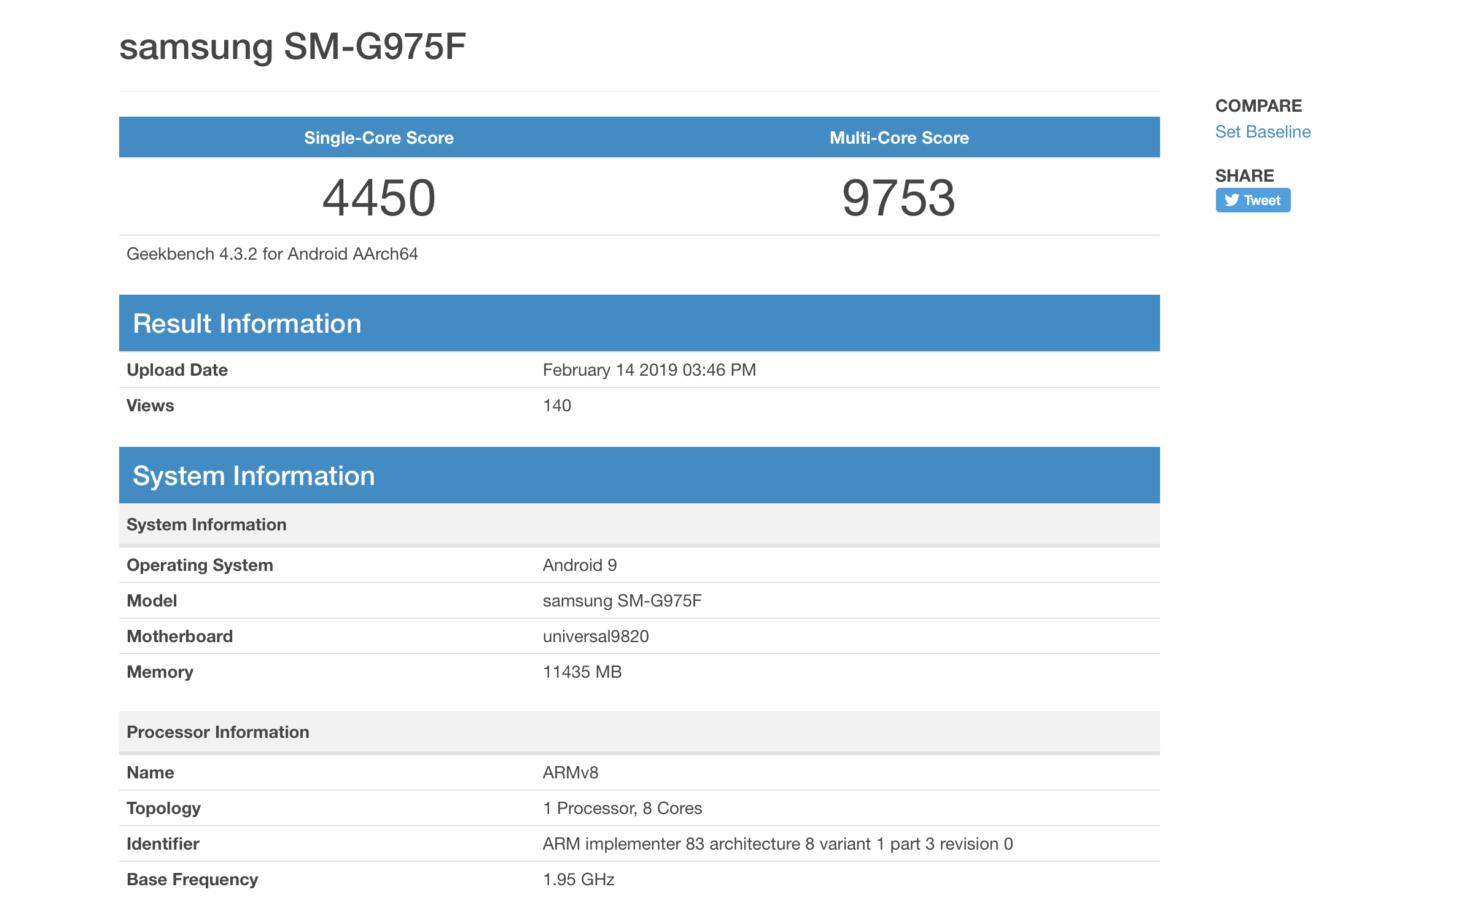 Galaxy S10 Plus GeekBench